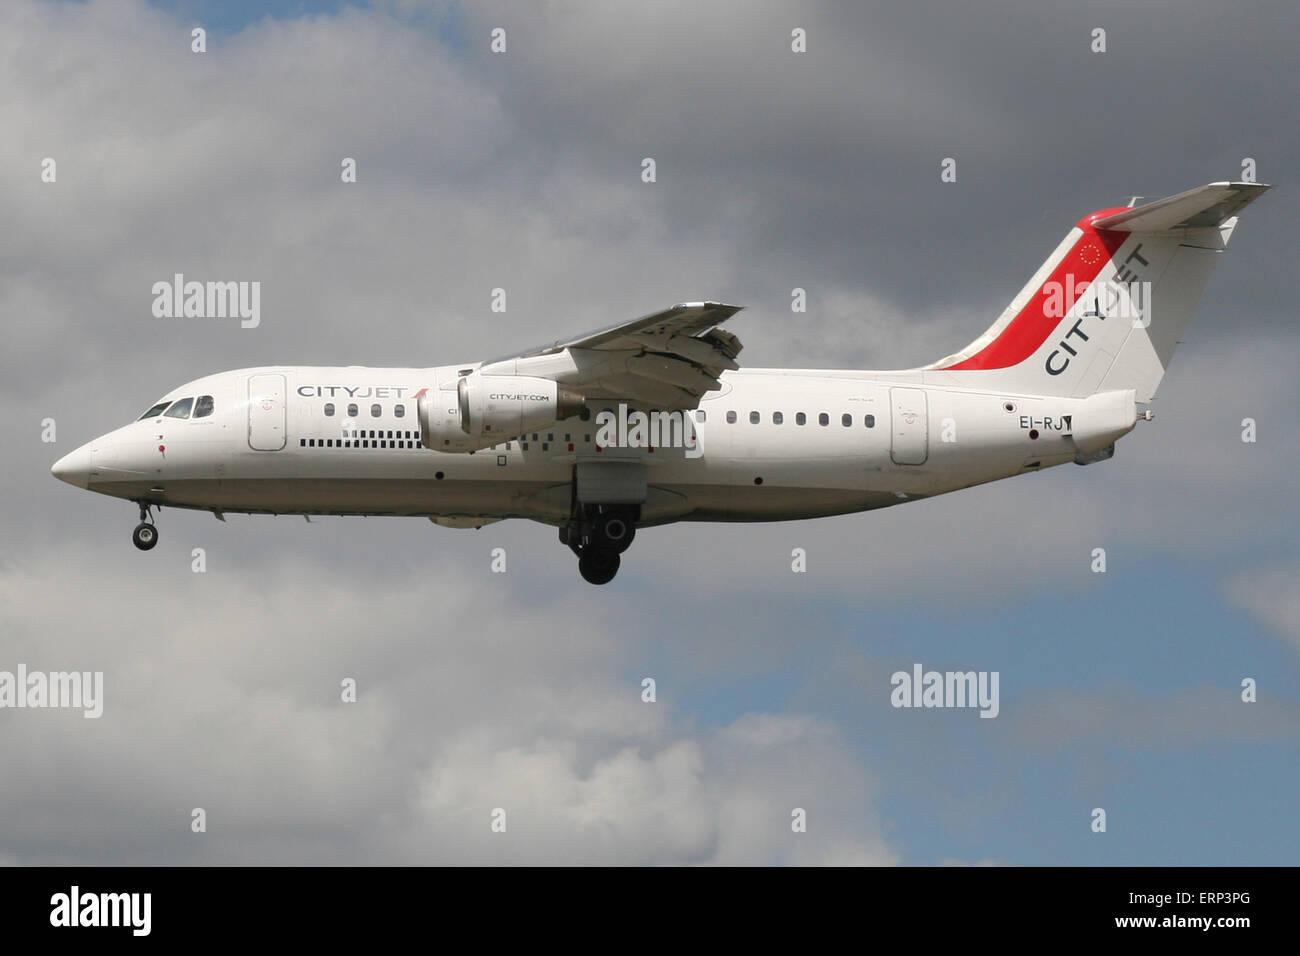 CITYJET BAE 146 RJ - Stock Image